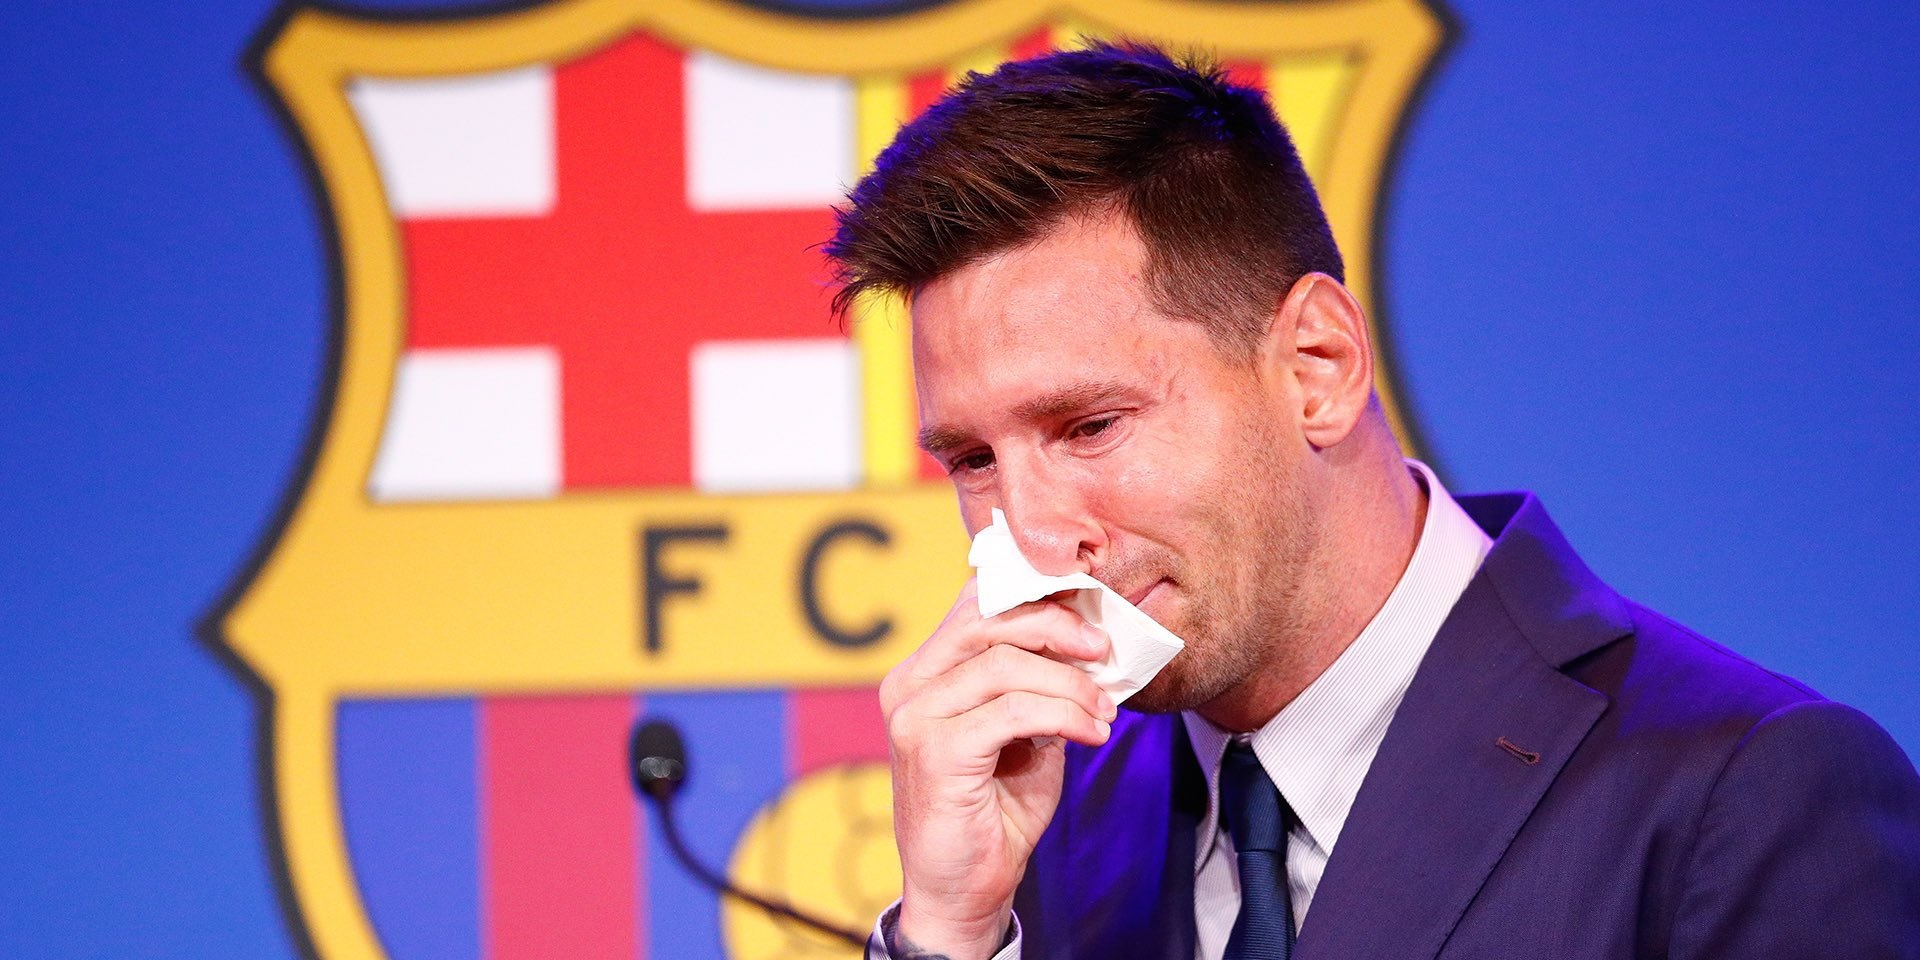 Leo Messi namedrops Liverpool in Barcelona exit presser